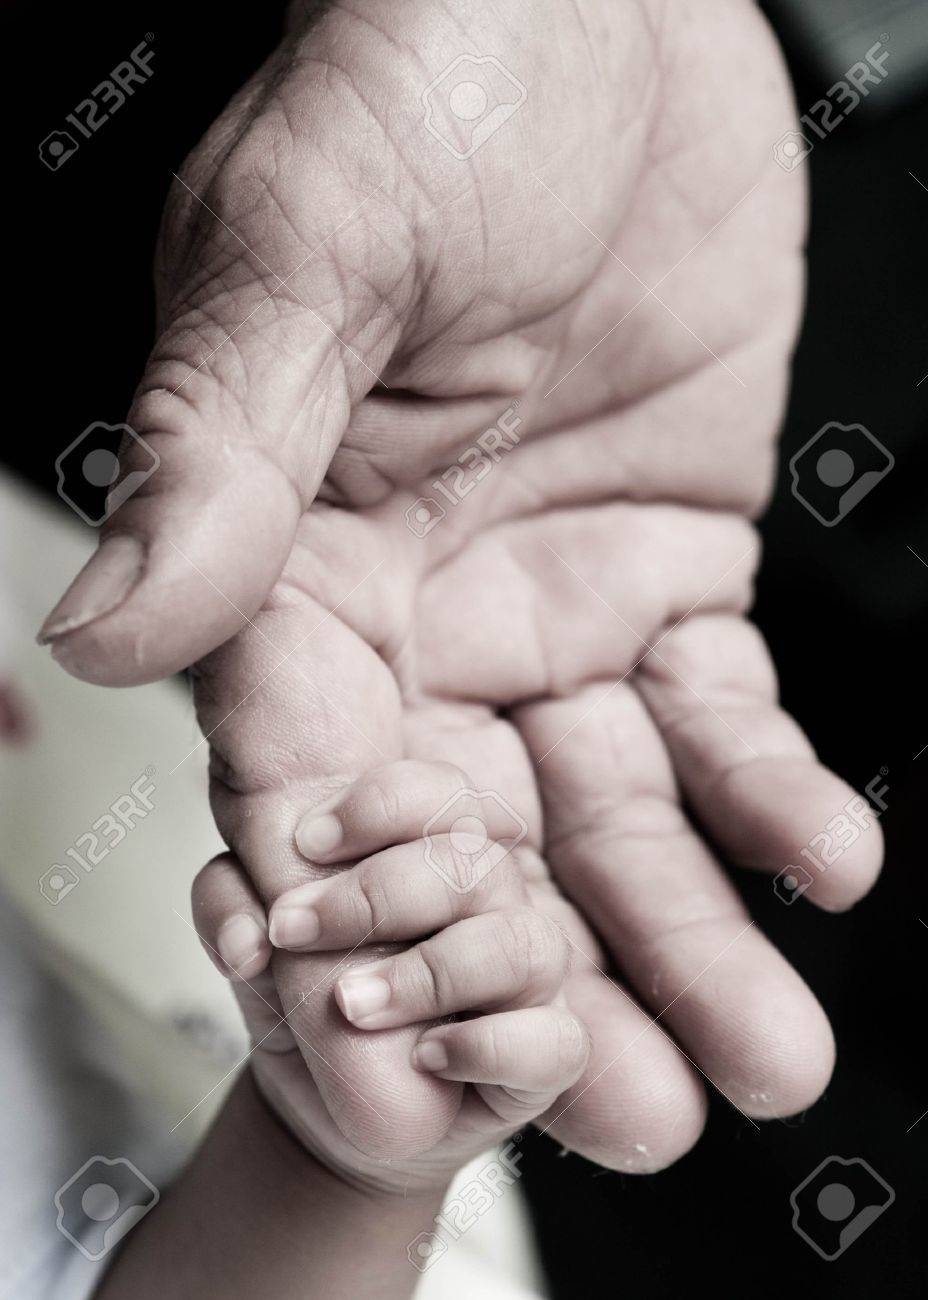 baby hand holding Rough finger - 11368262